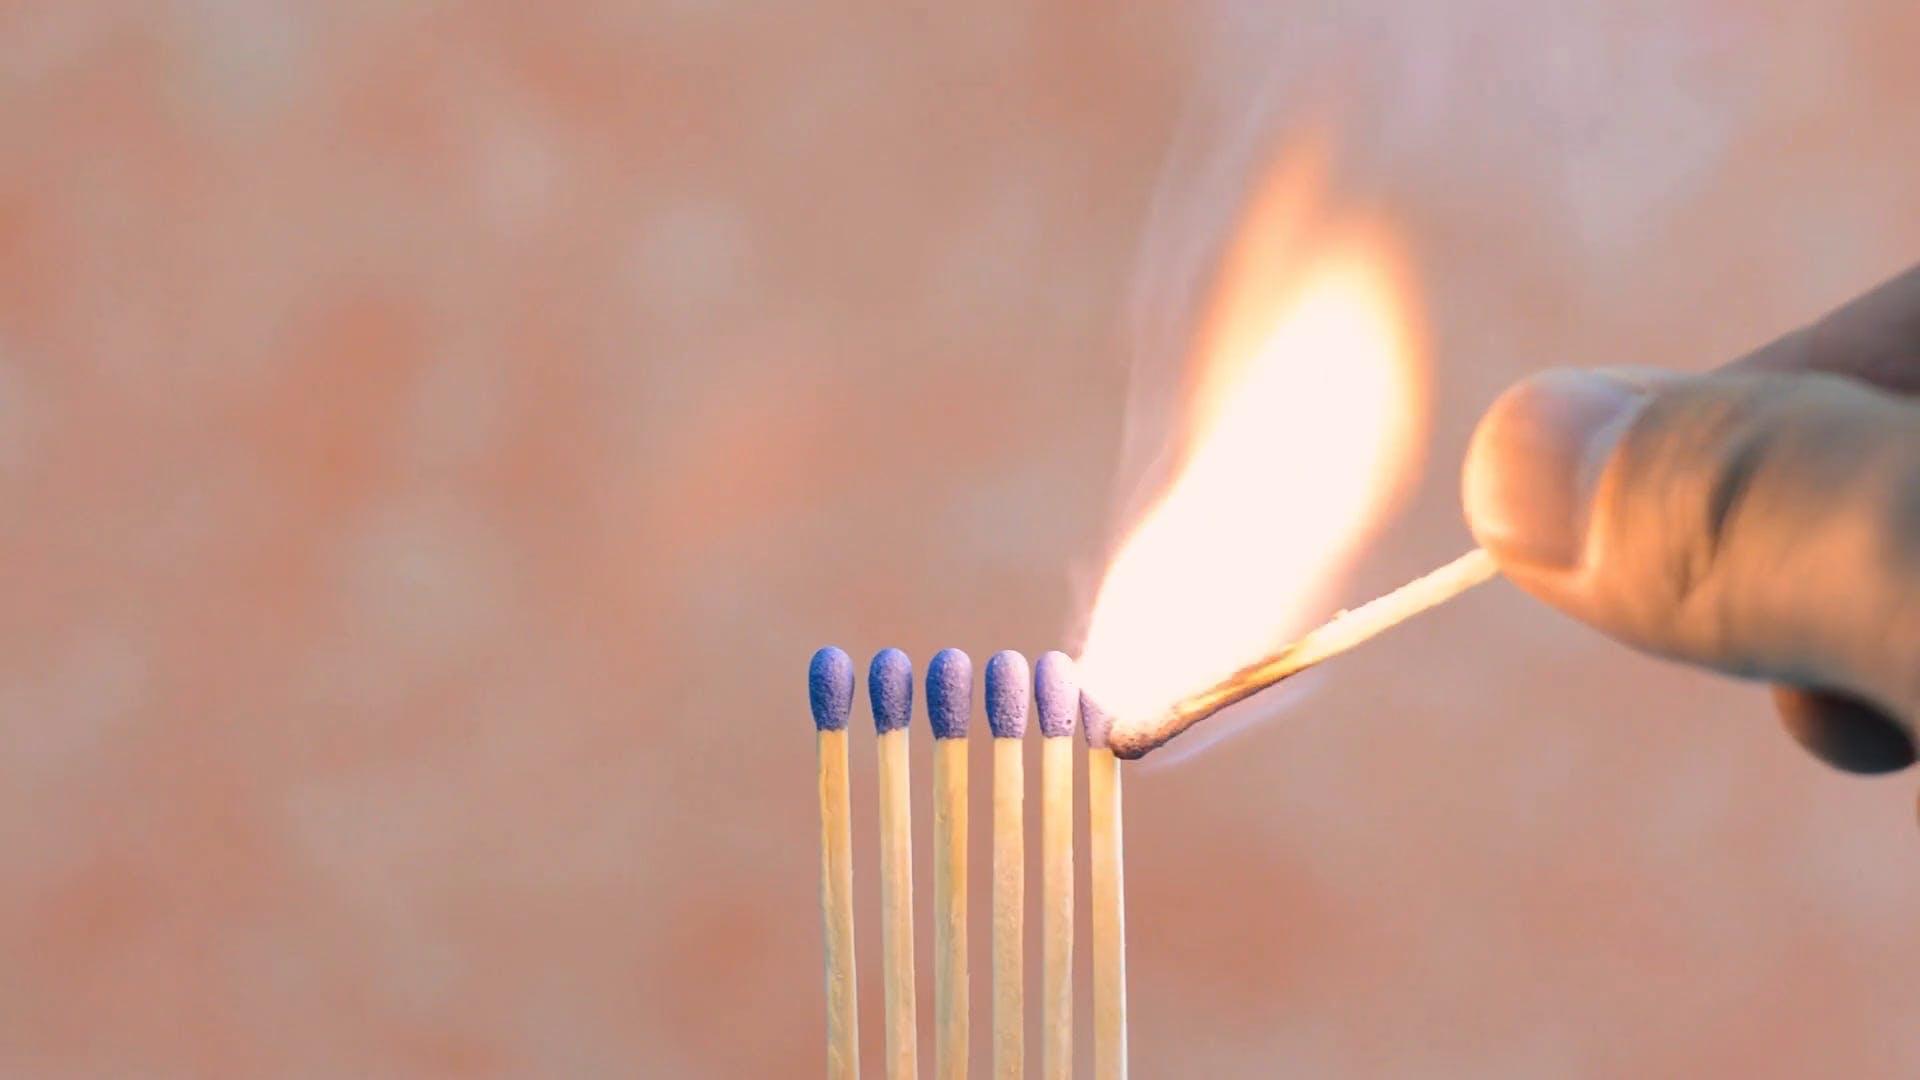 Match Sticks Burning